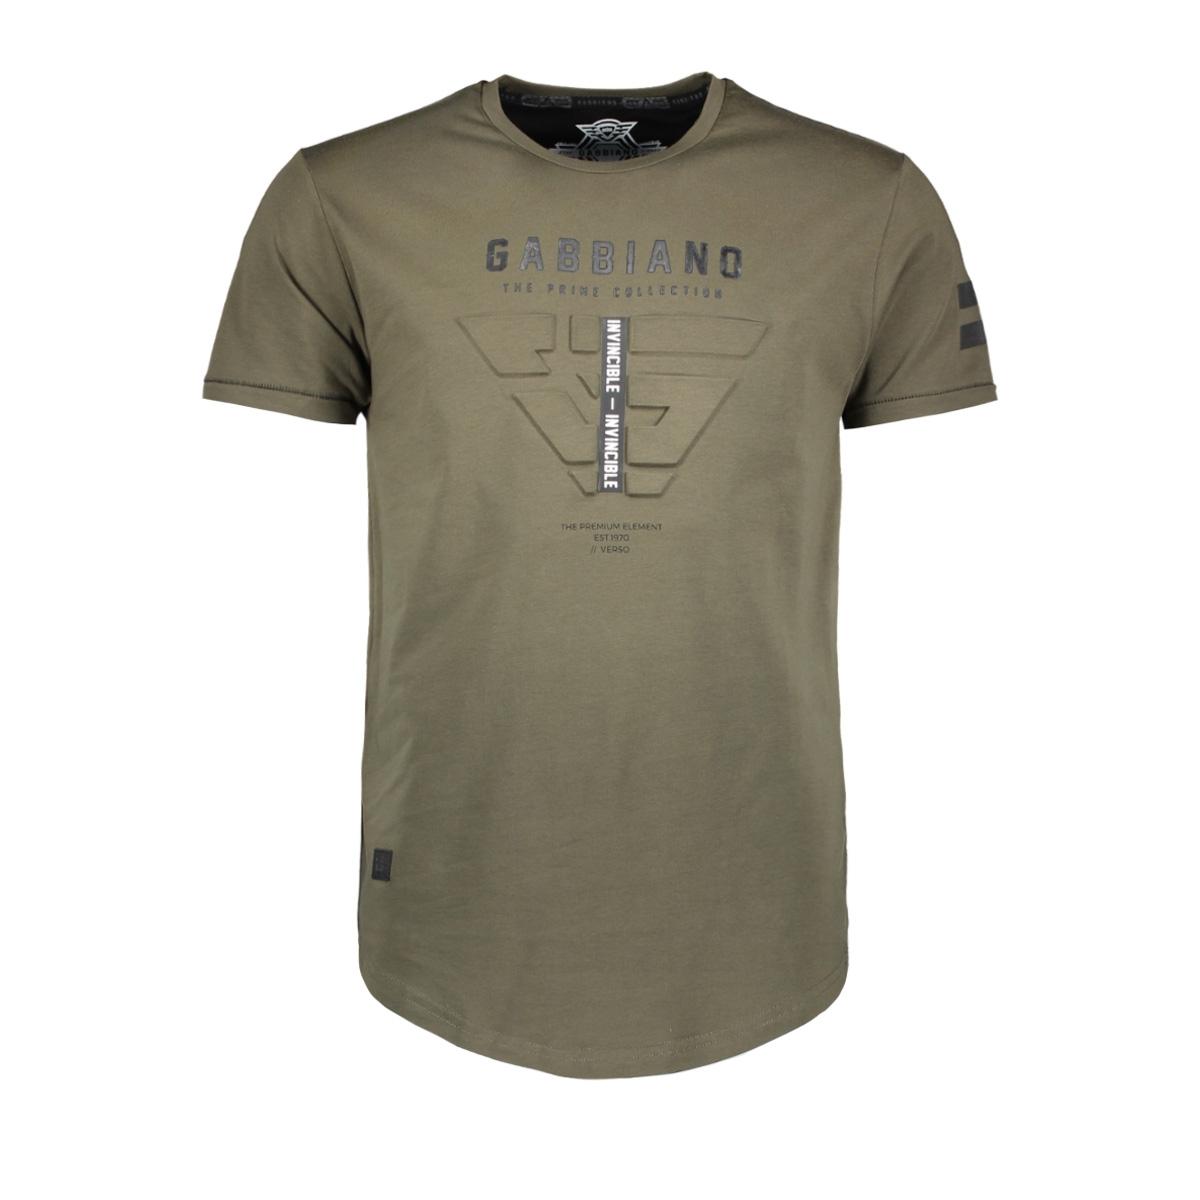 13859 gabbiano t-shirt army